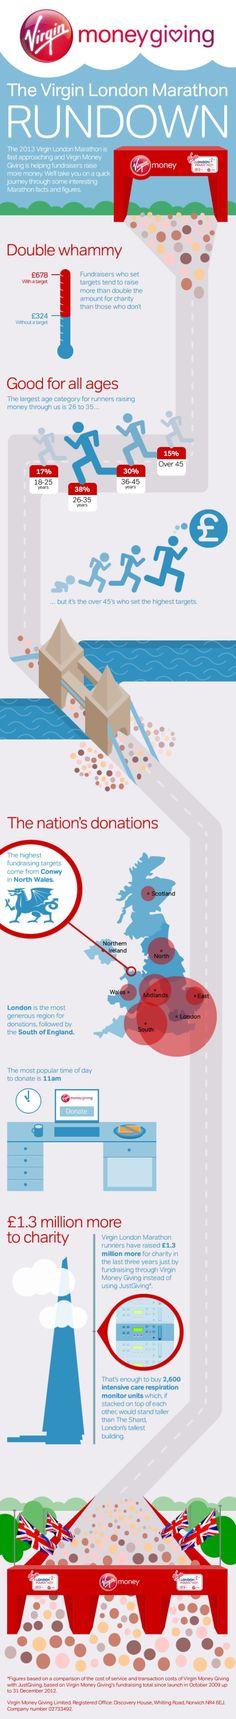 Virgin London Marathon - Some amazing numbers from Virgin London Marathon fundraising runners